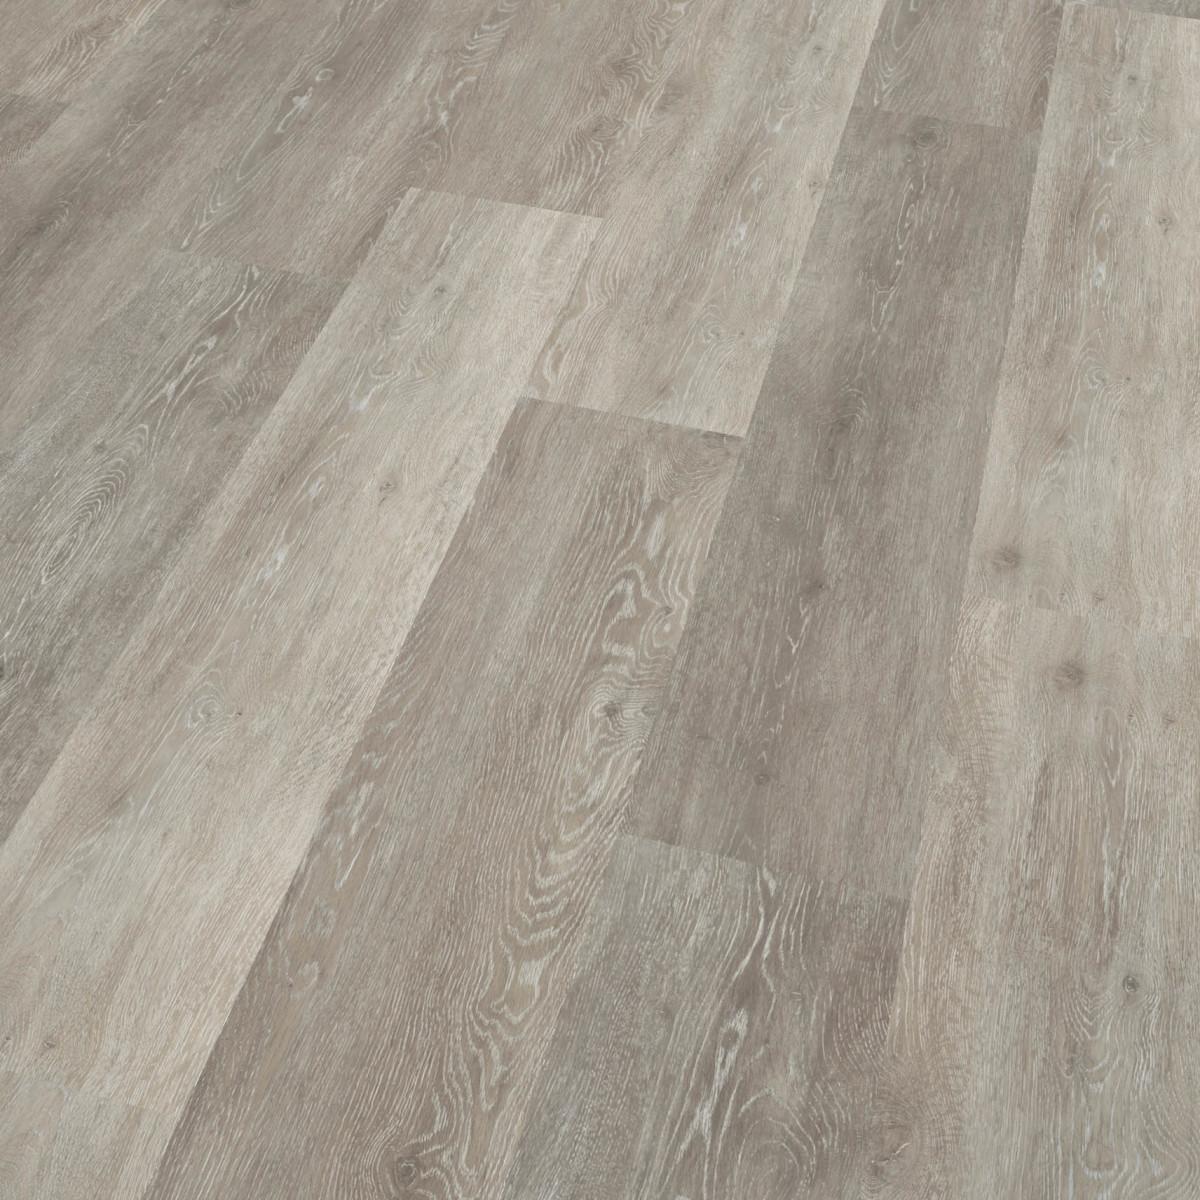 3037 Limed Oak Grey Cavalio Flooring